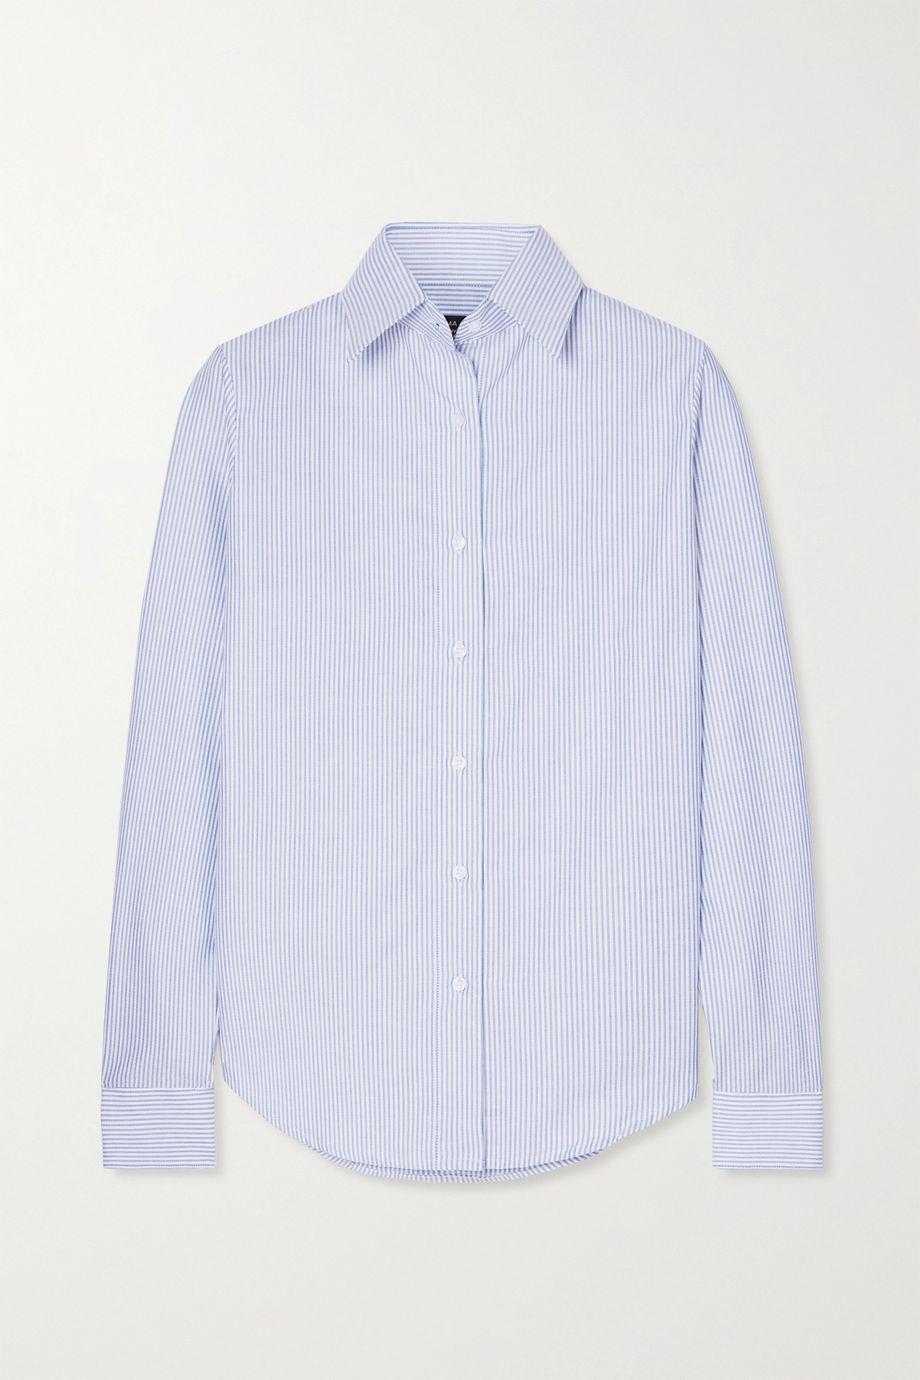 Emma Willis Striped cotton Oxford shirt